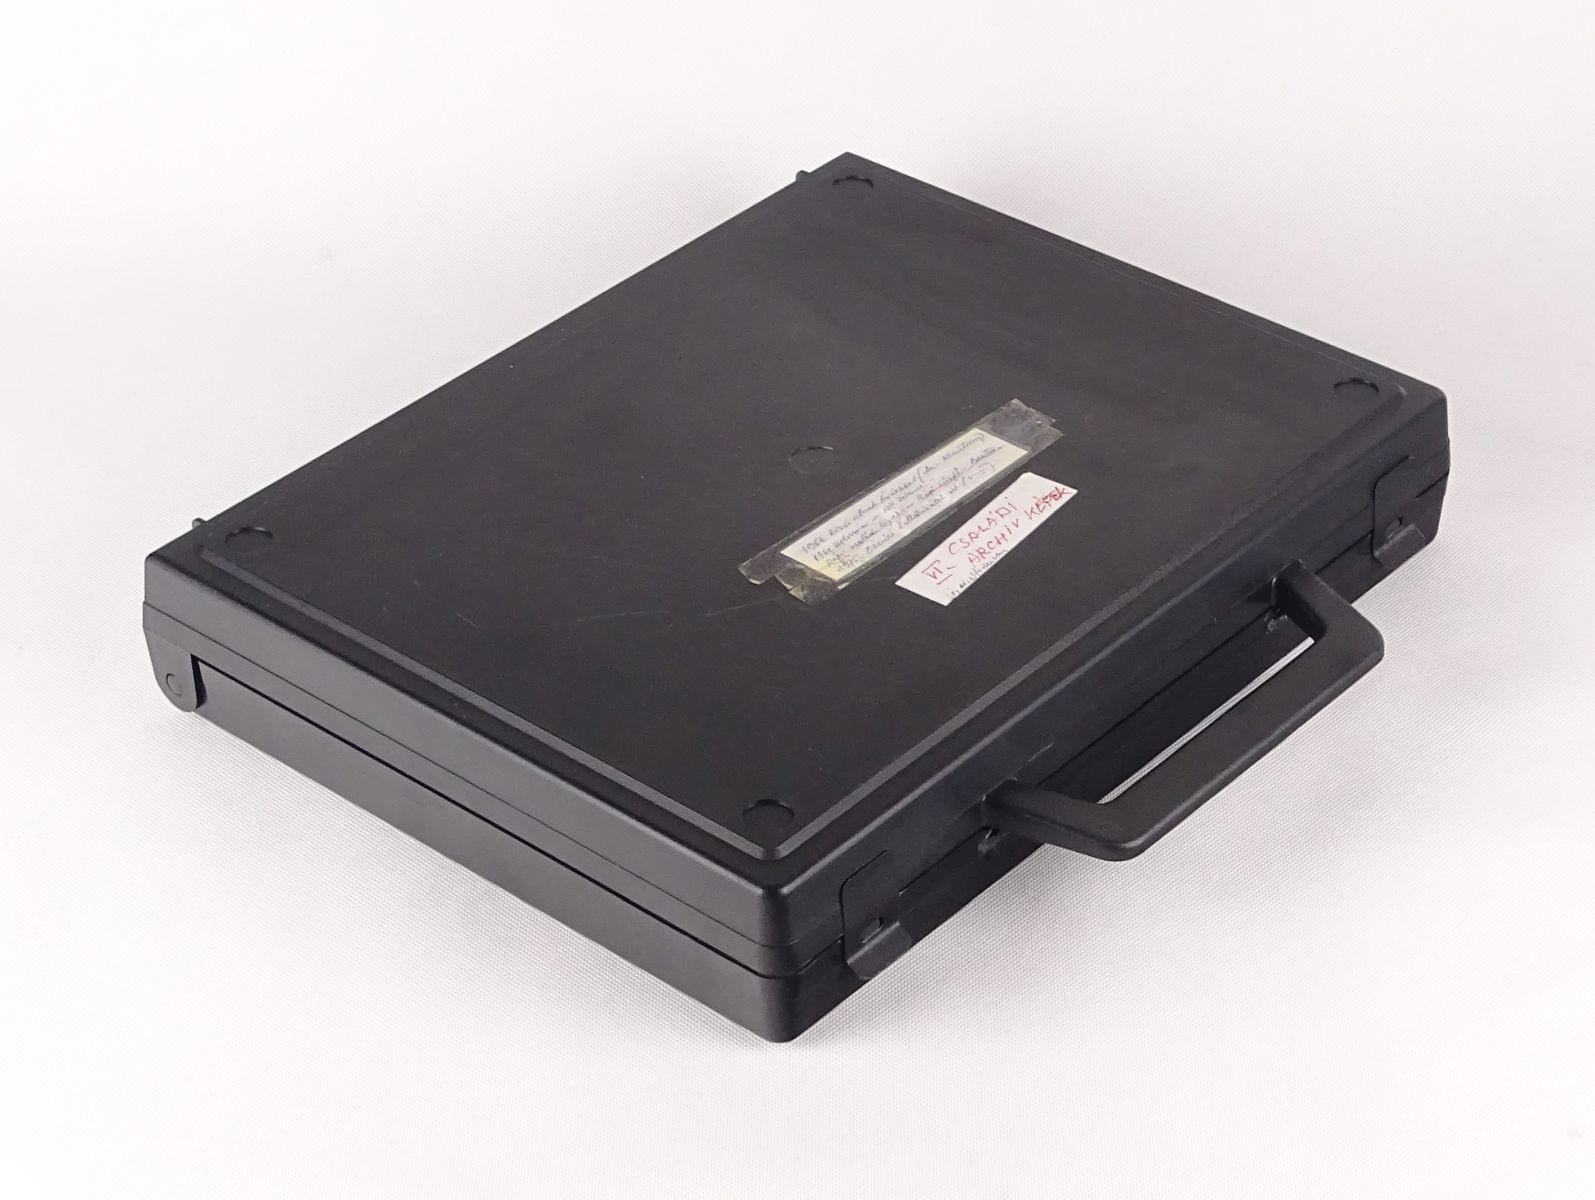 DSC06571.JPG (1595×1200)